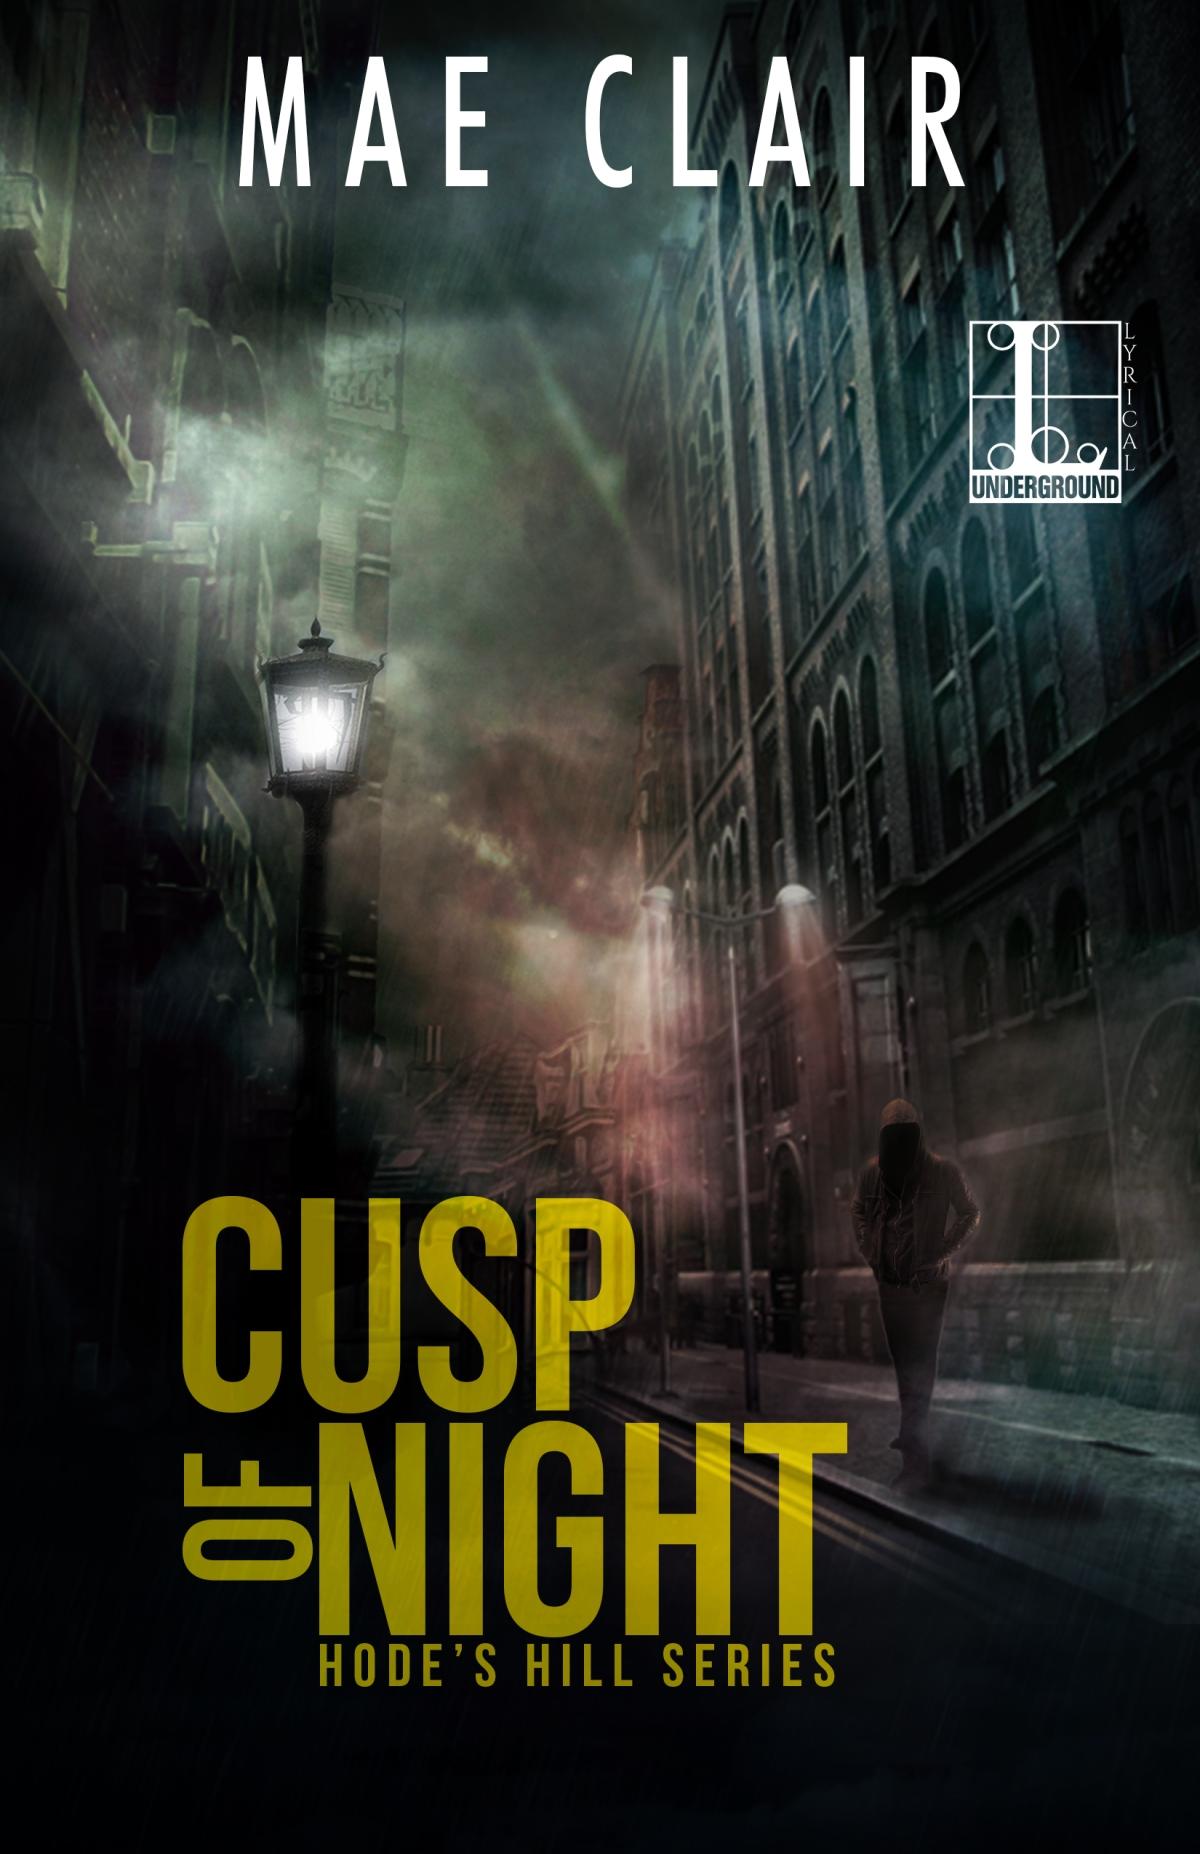 Clair_CuspOfNight (1)